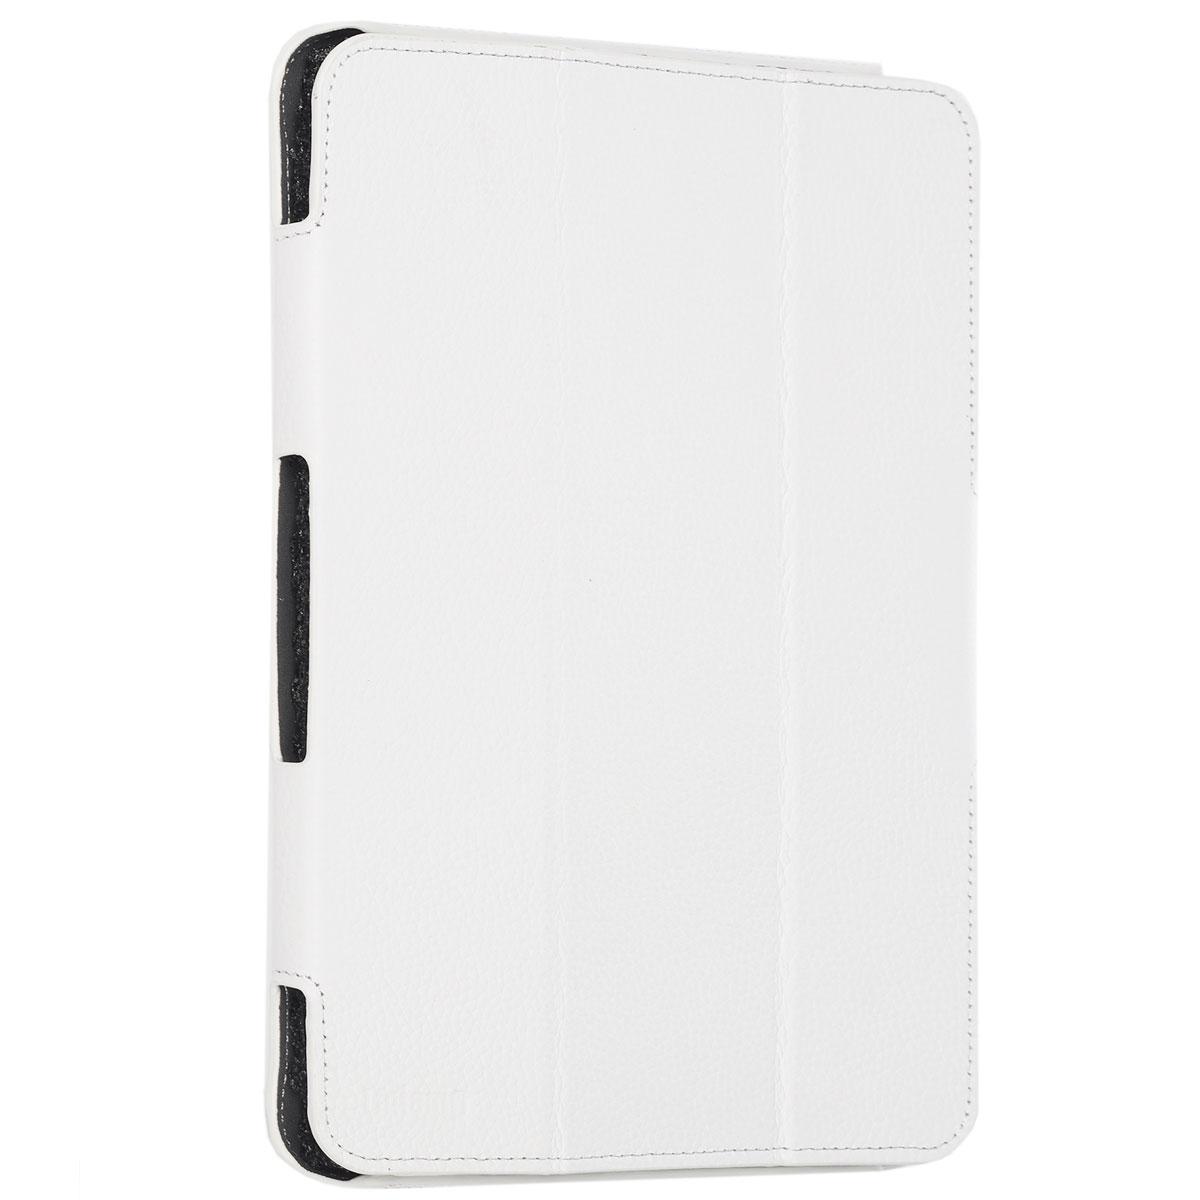 Untamo Alto чехол для Samsung Galaxy Tab 4 10.1, White UALSGT410WH